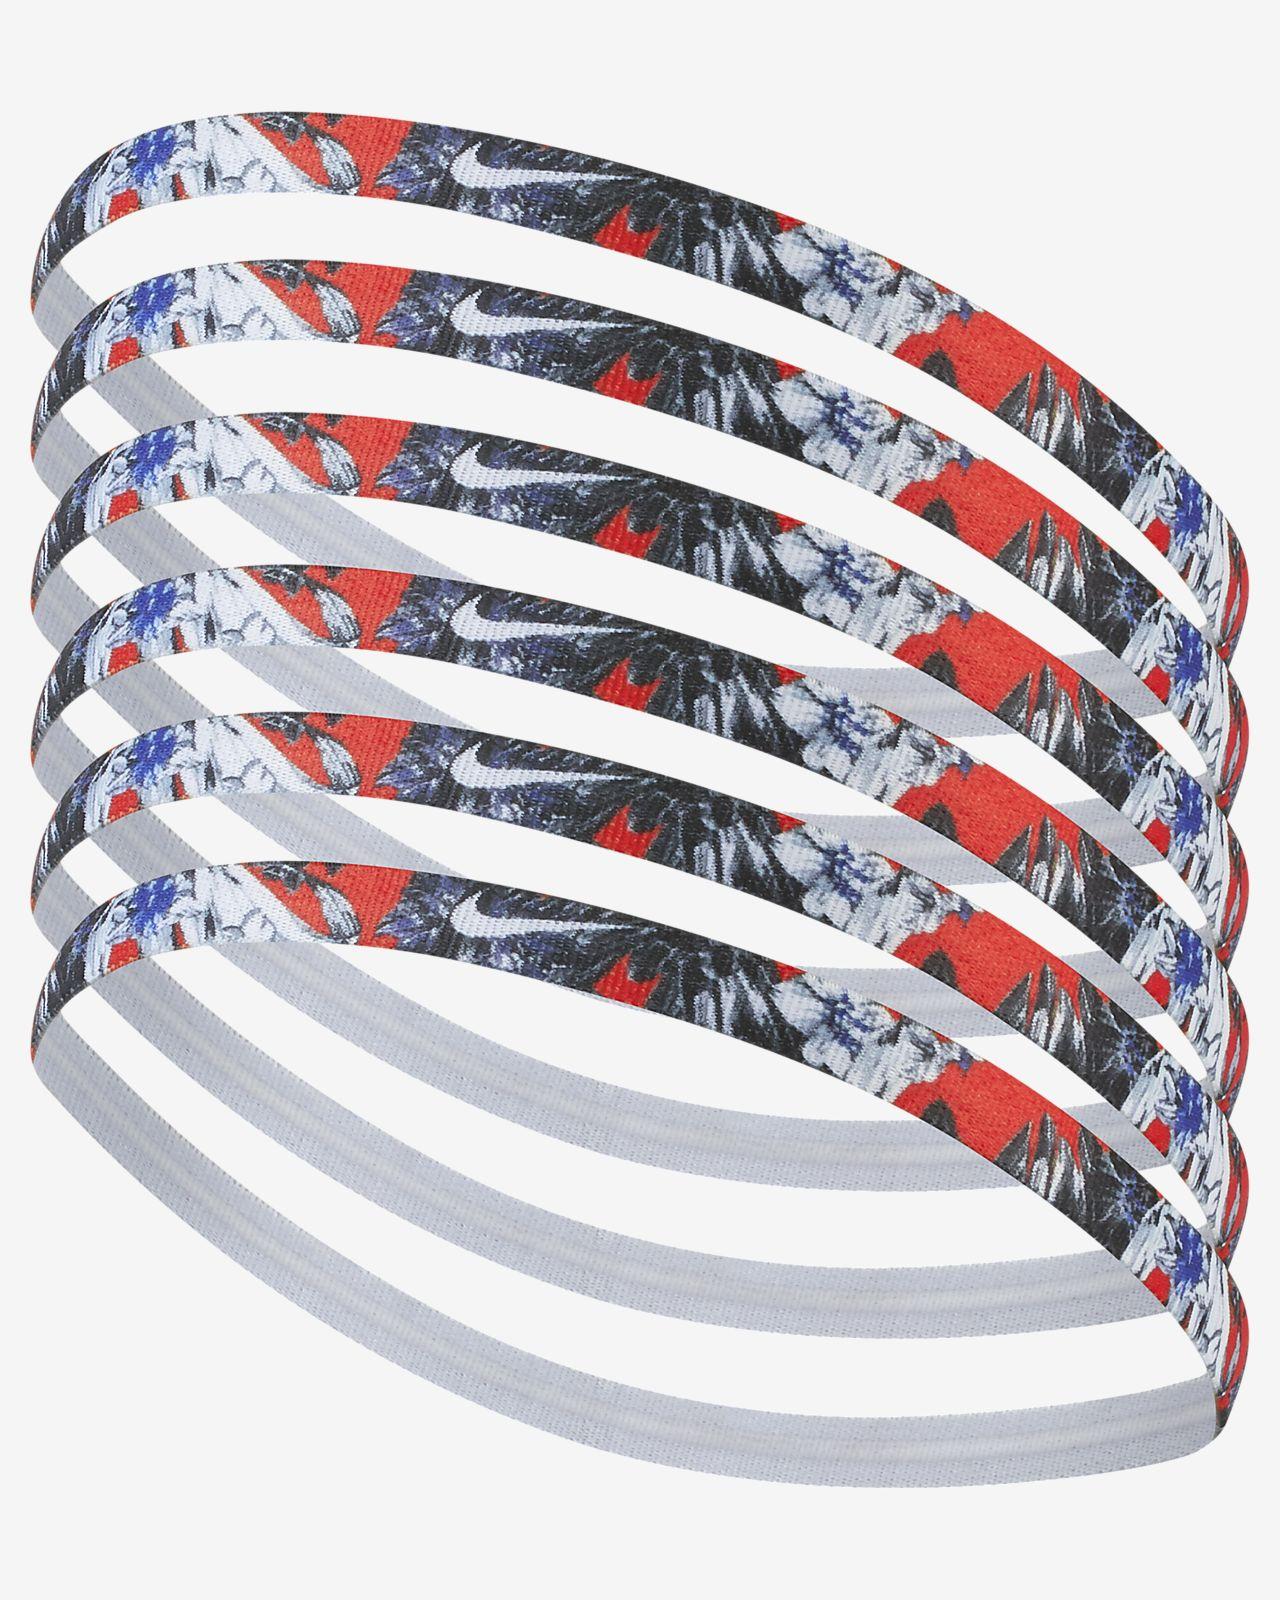 Pannband Nike Printed (6-pack)